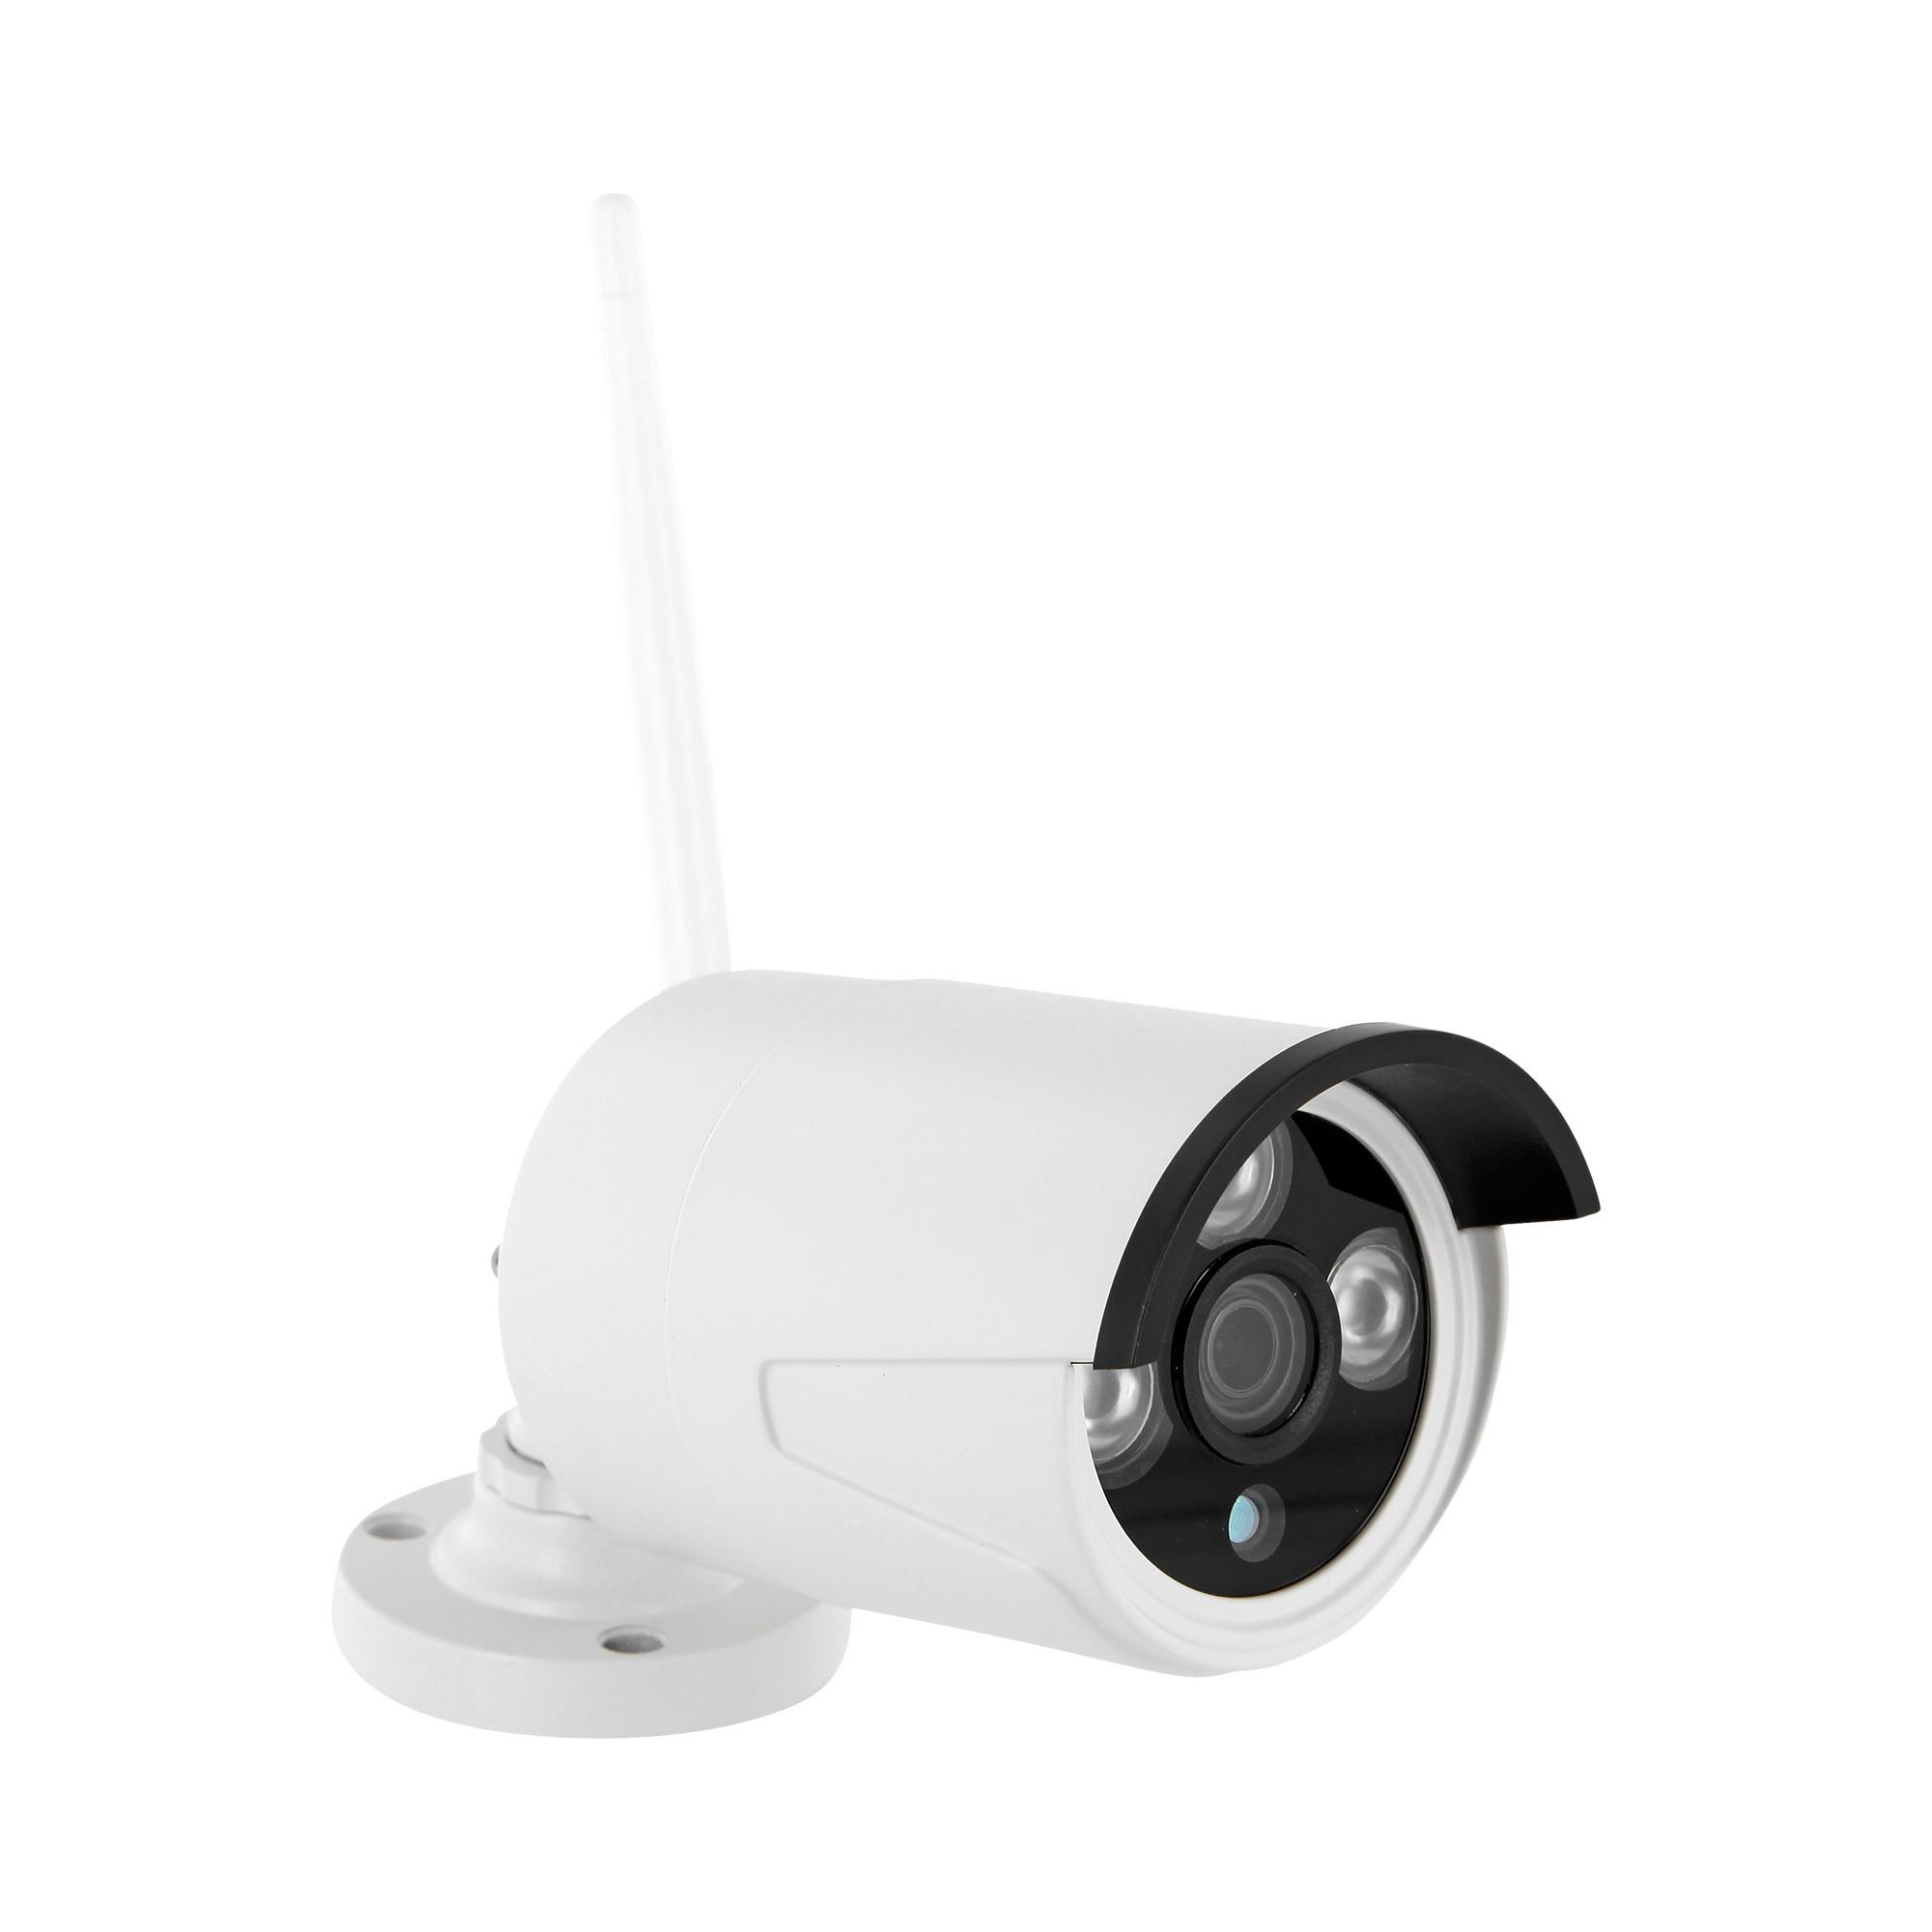 w lan hd wifi nvr lan berwachungssystem 1 3 mp 960p 8 x wifi kameras mit app. Black Bedroom Furniture Sets. Home Design Ideas